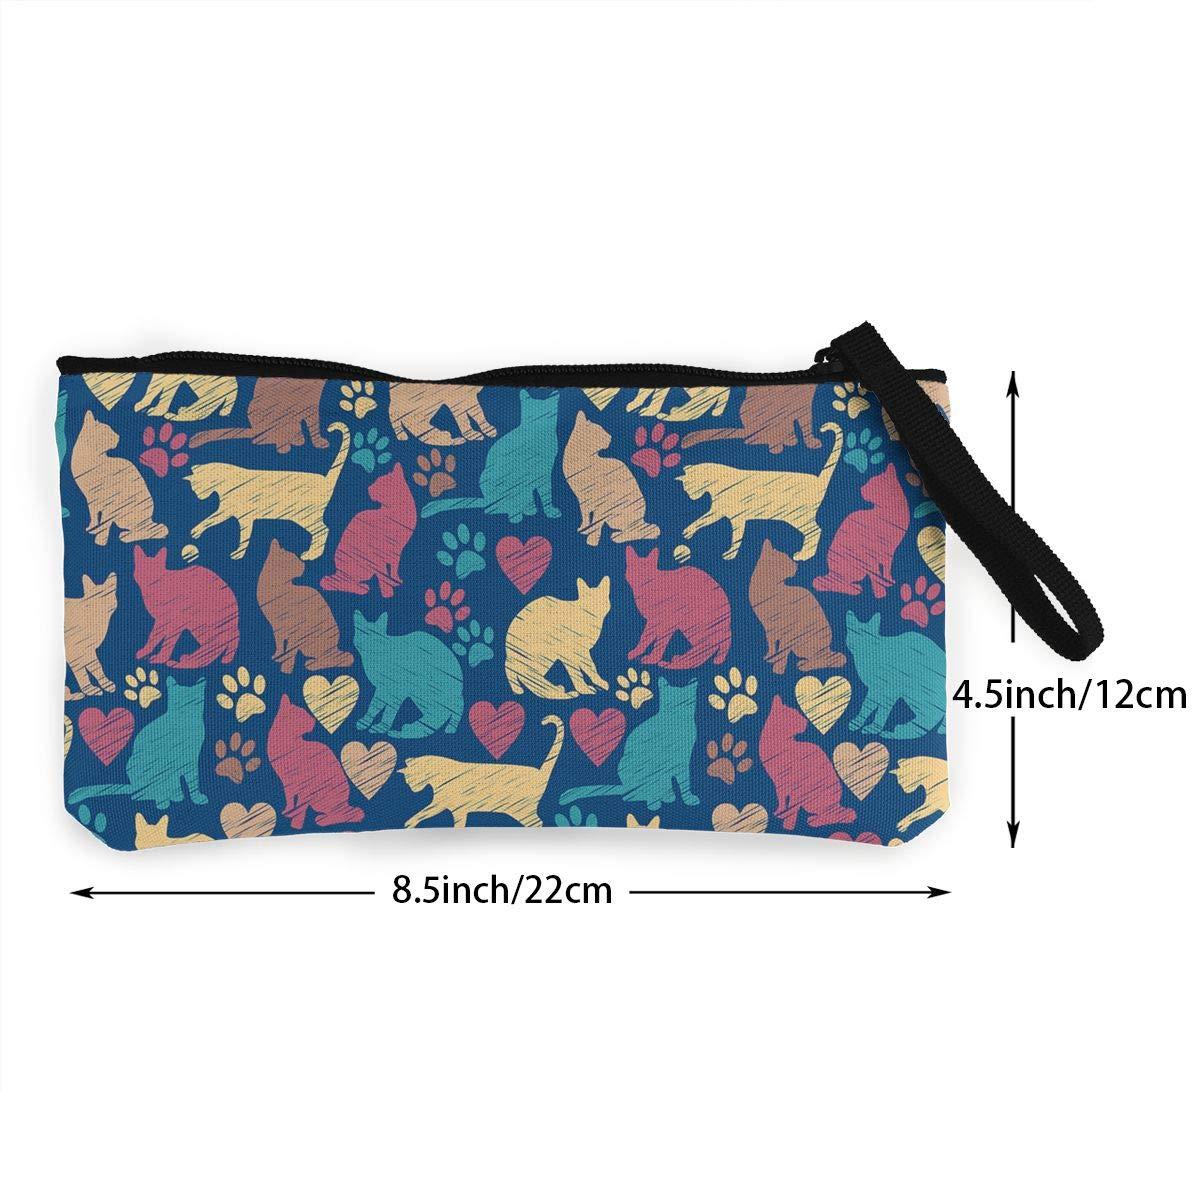 Canvas Coin Purse Colorful Cat Paw Print Change Cash Bag Zipper Small Purse Wallets